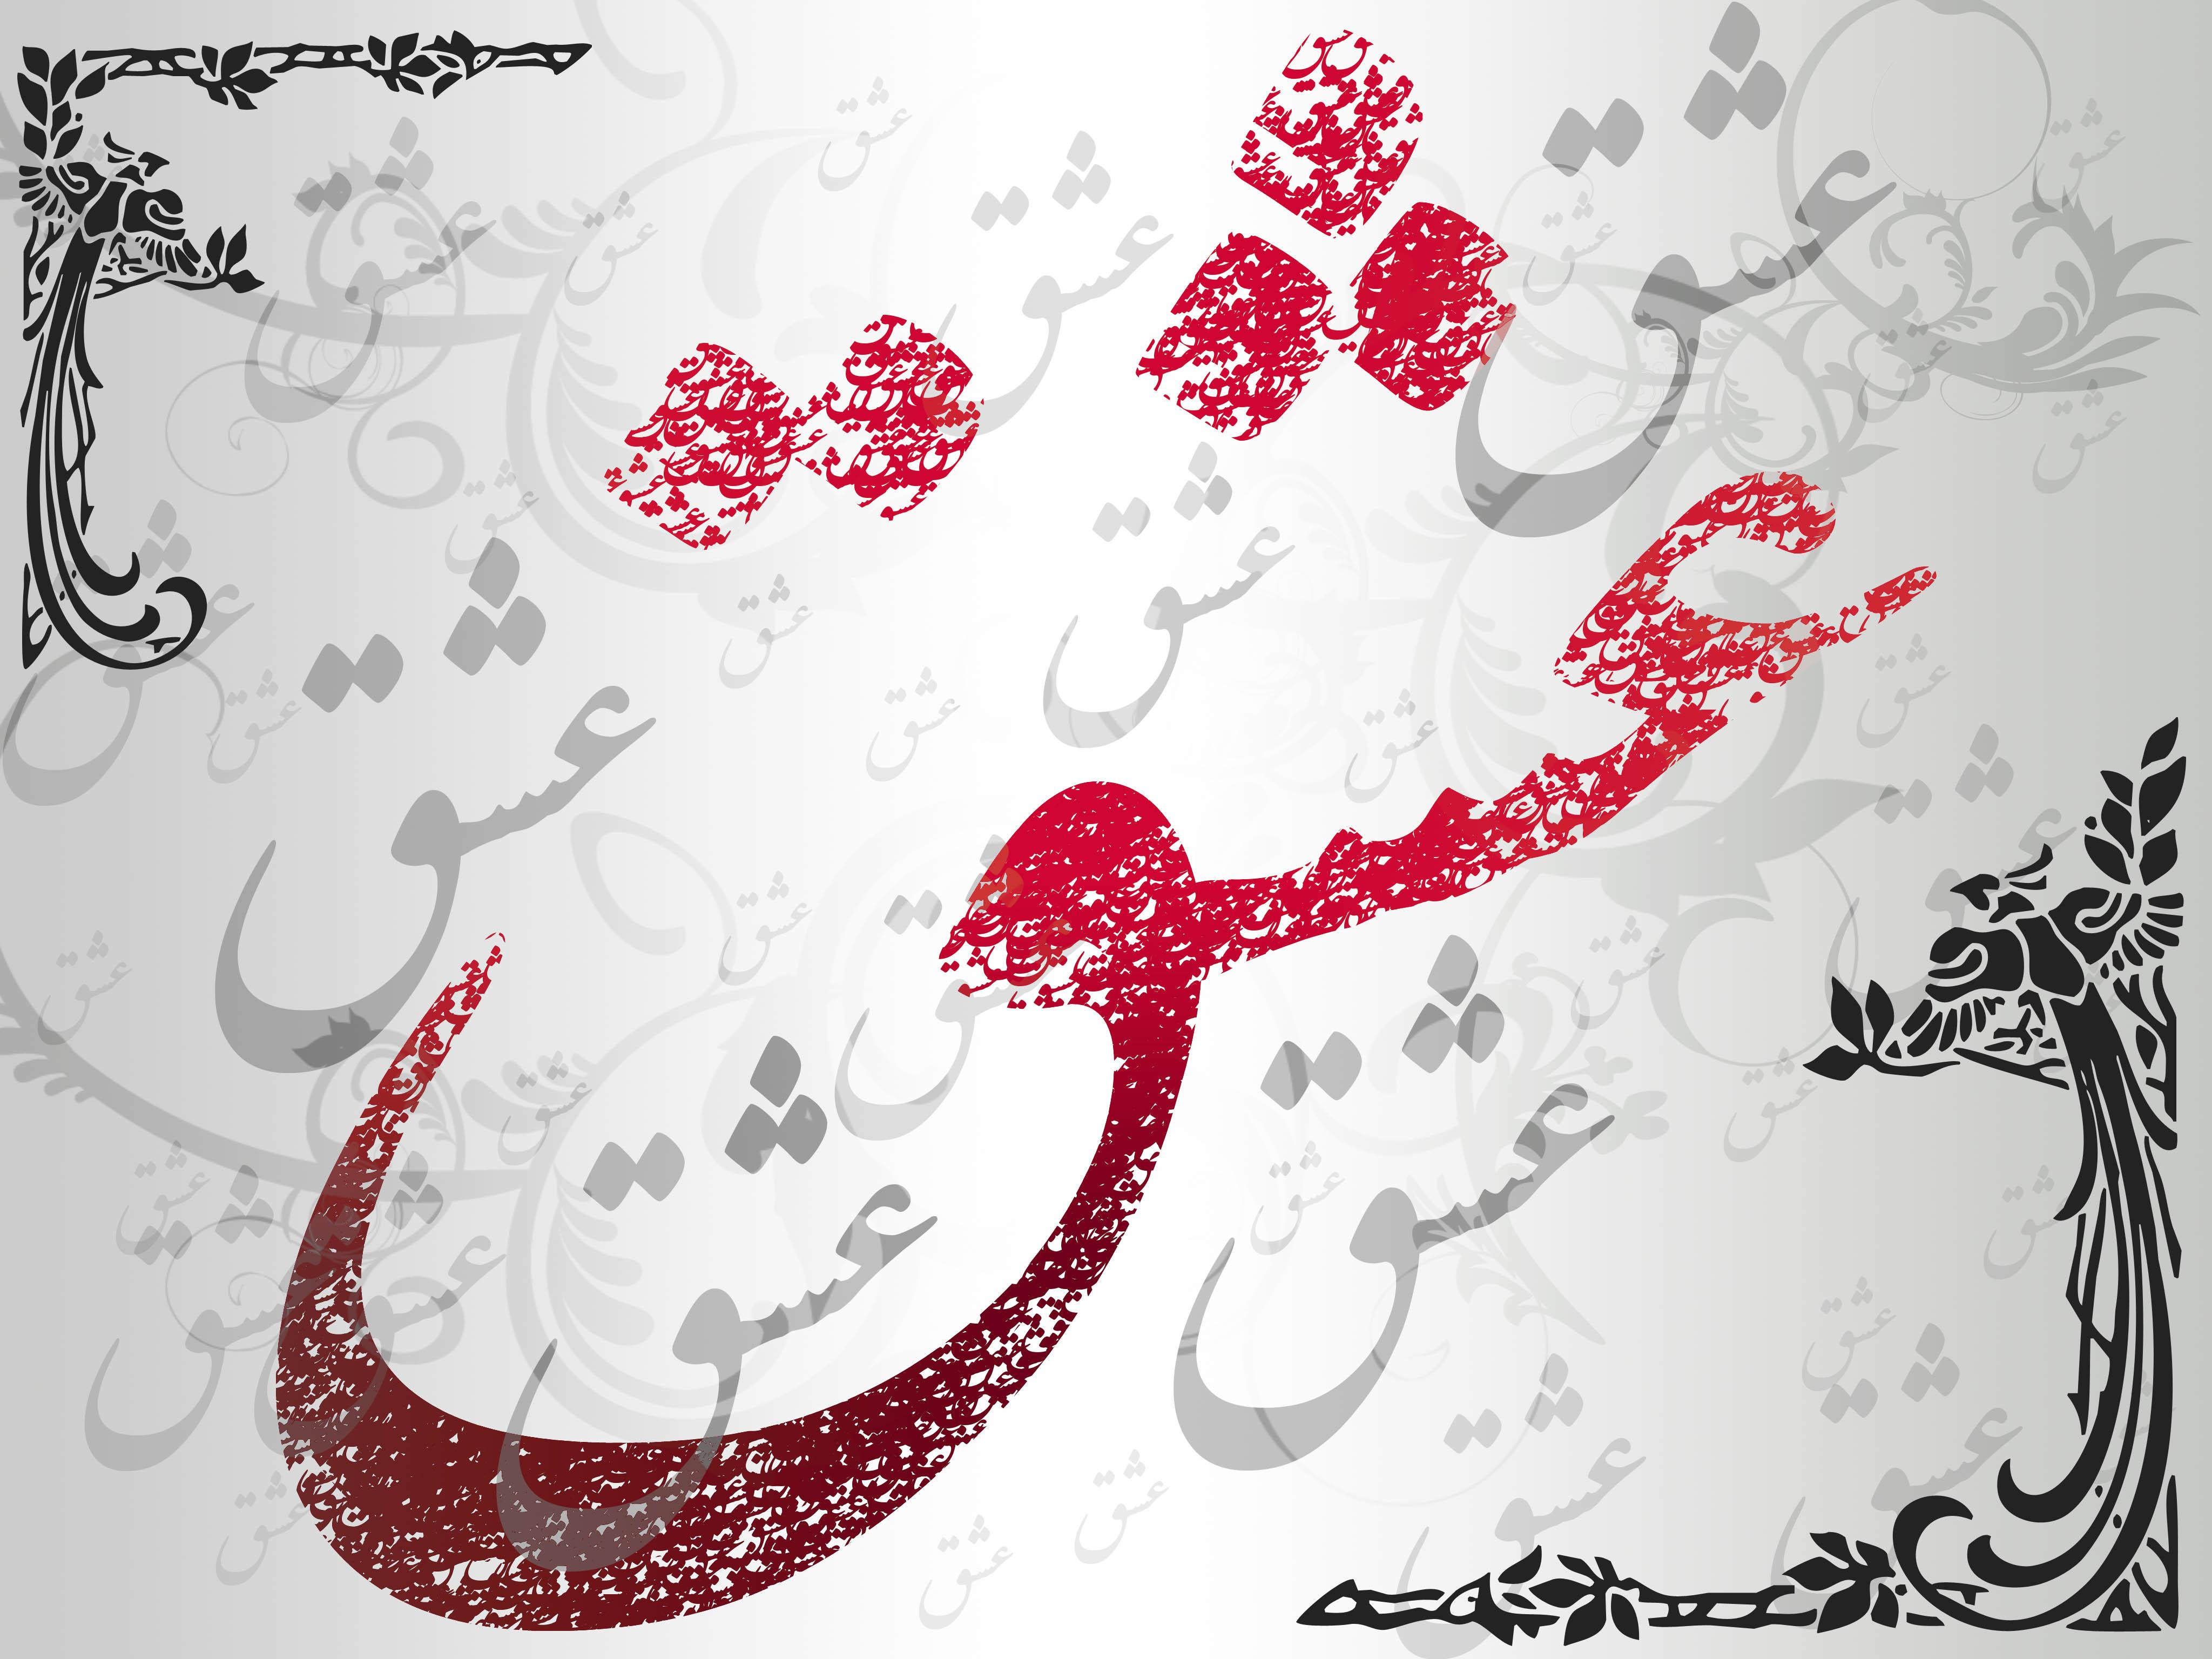 http://fc08.deviantart.net/fs40/f/2009/018/4/9/iranian_love_eshgh_by_mayvood.jpg